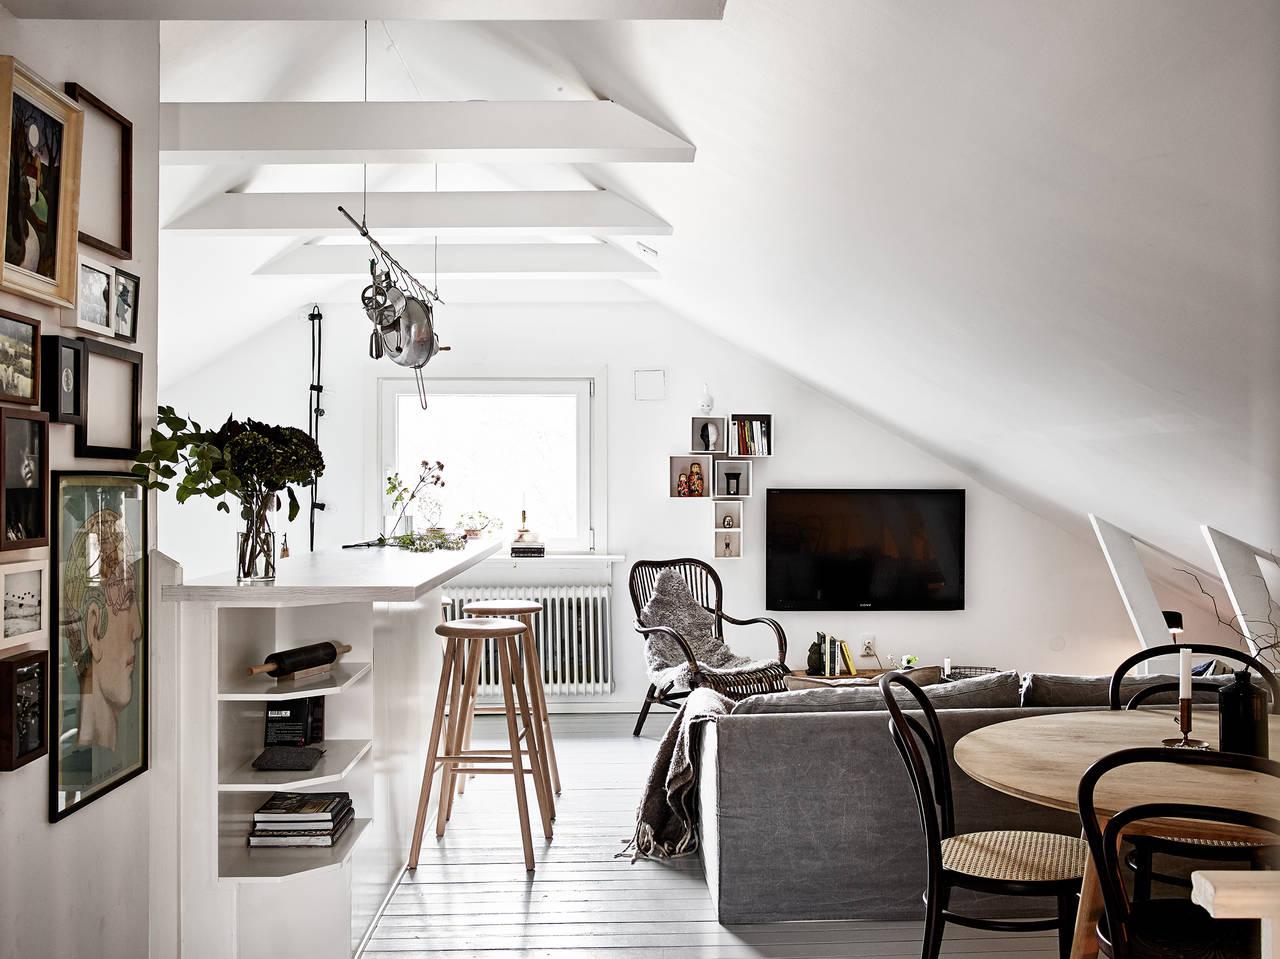 Шведские квартиры, скандинавский дизайн